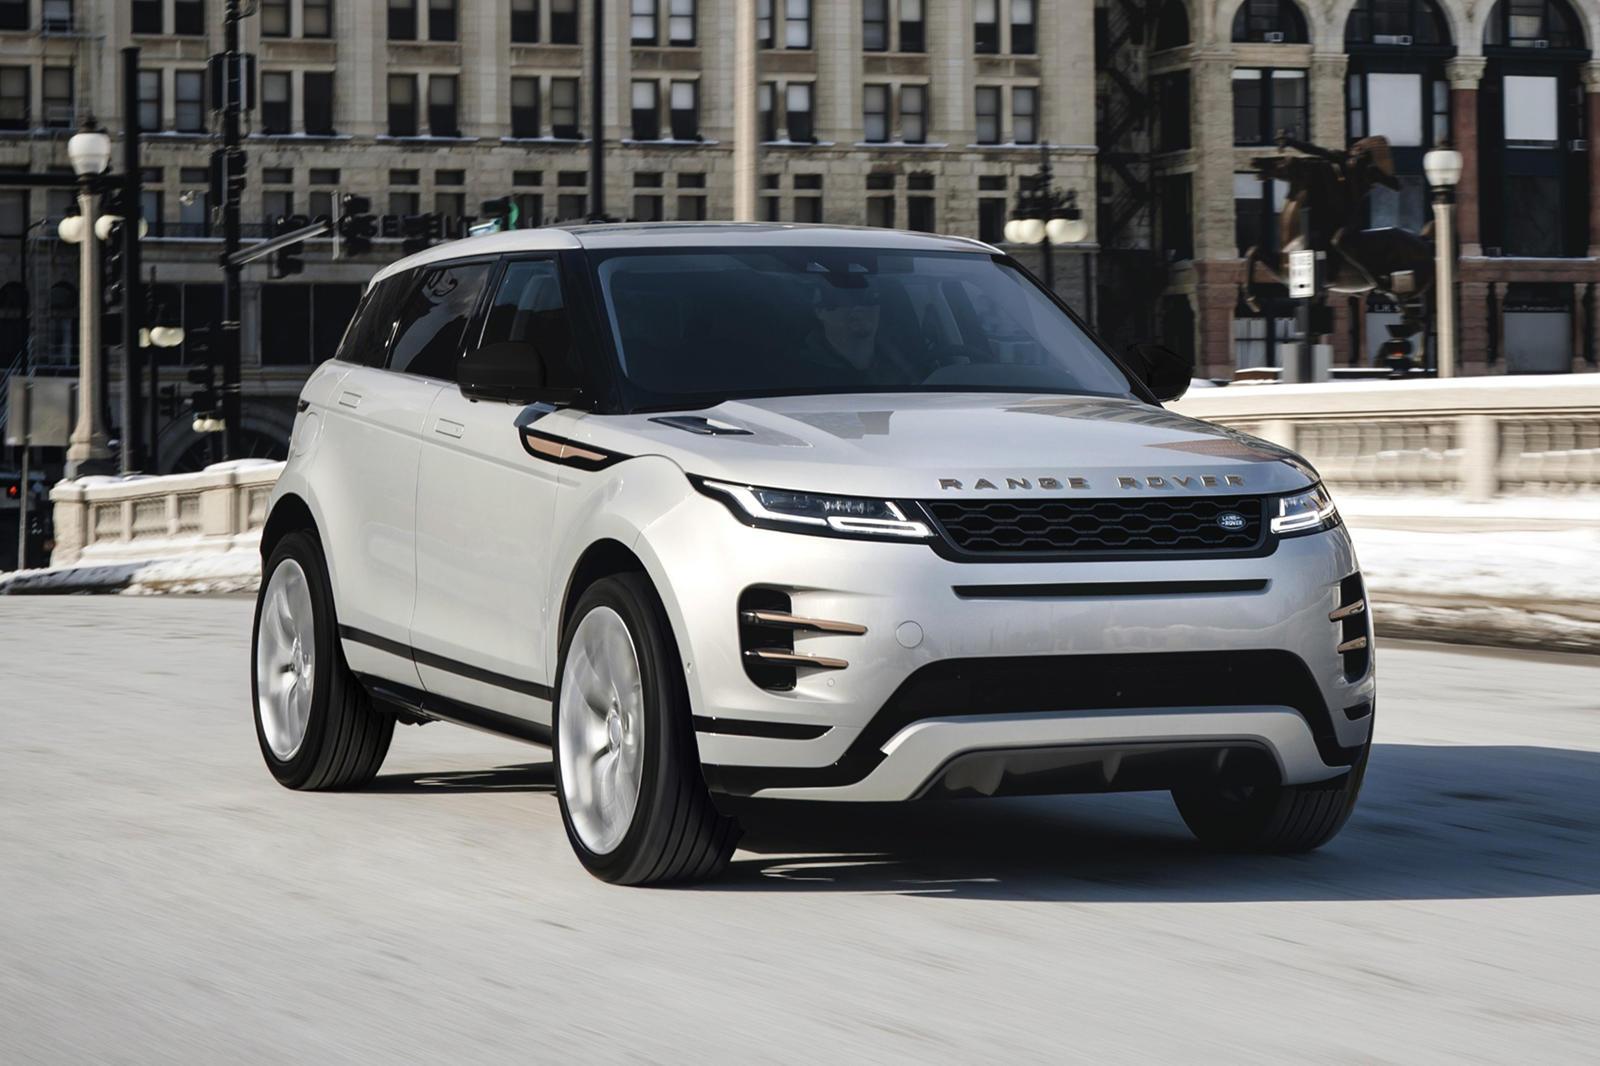 Best Luxury Compact Suv 2021